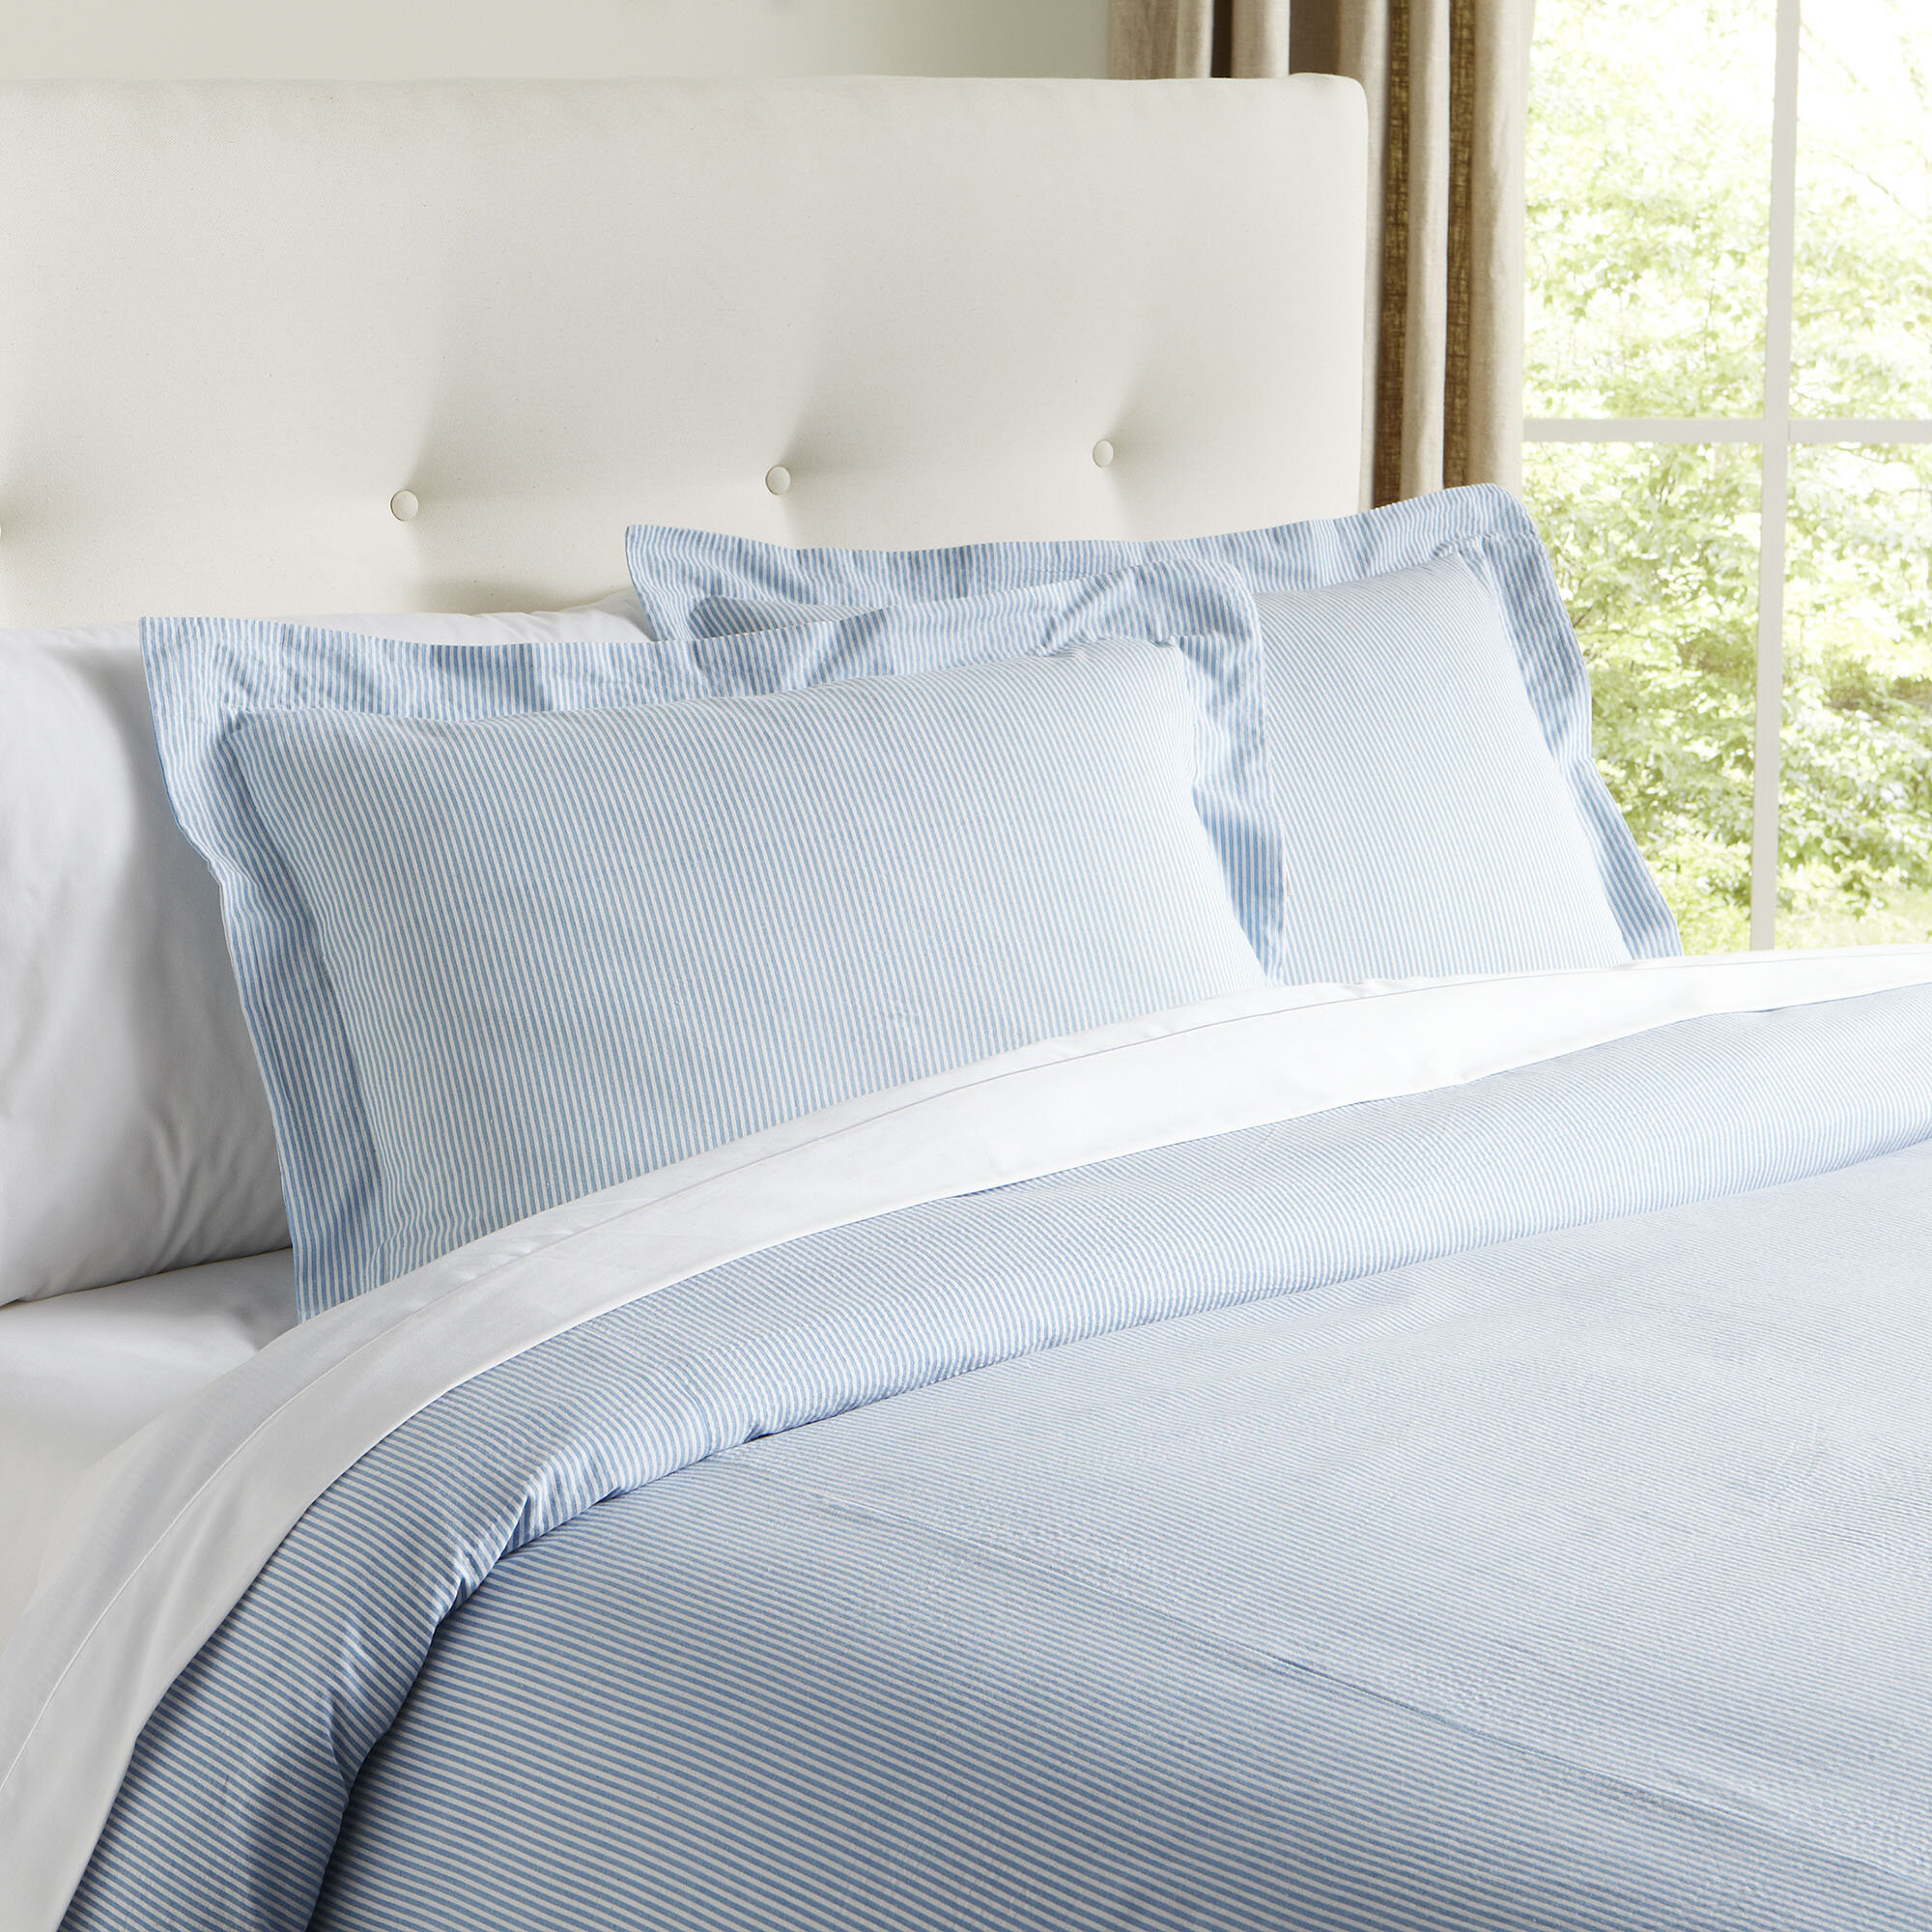 duvet duvets iris cover bedding blue seersucker stripe sky white and products set stripes